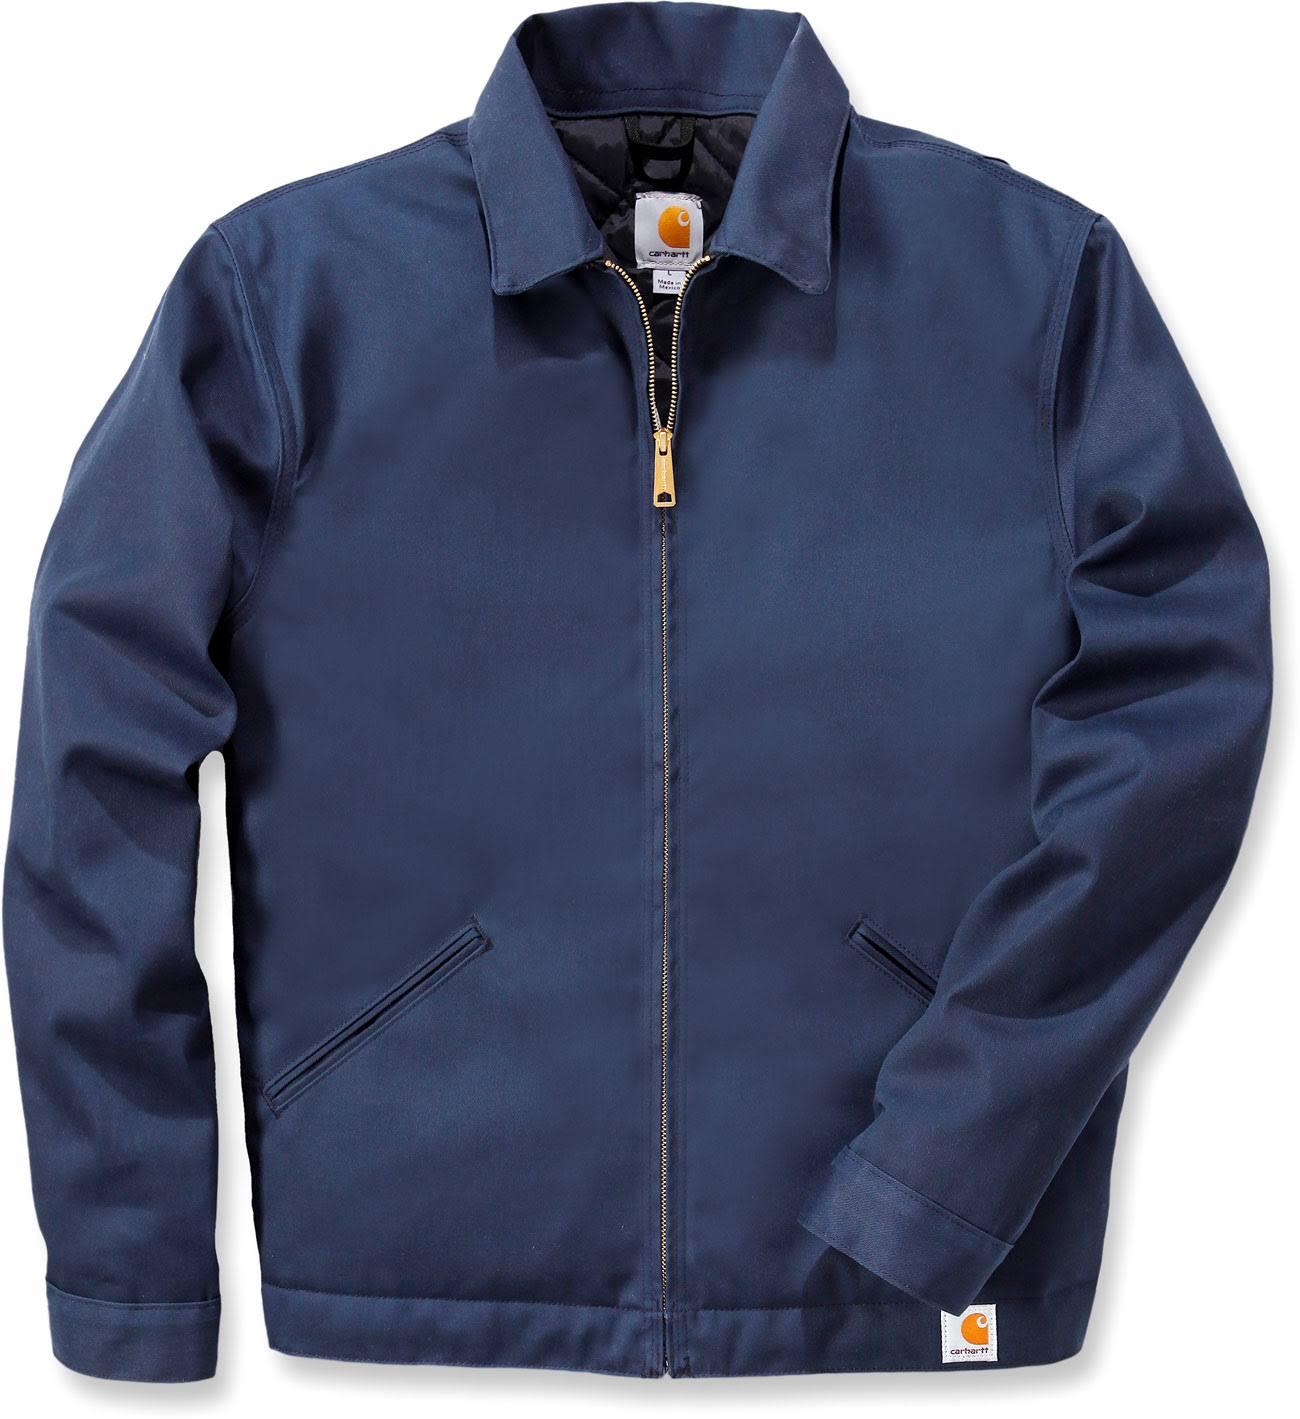 Carhartt Sarga Marino Azul Ajustable Con Hombre Chaqueta Nylon De Recubierto Para Forro Abrigo Trabajo rO4nxw7ETr